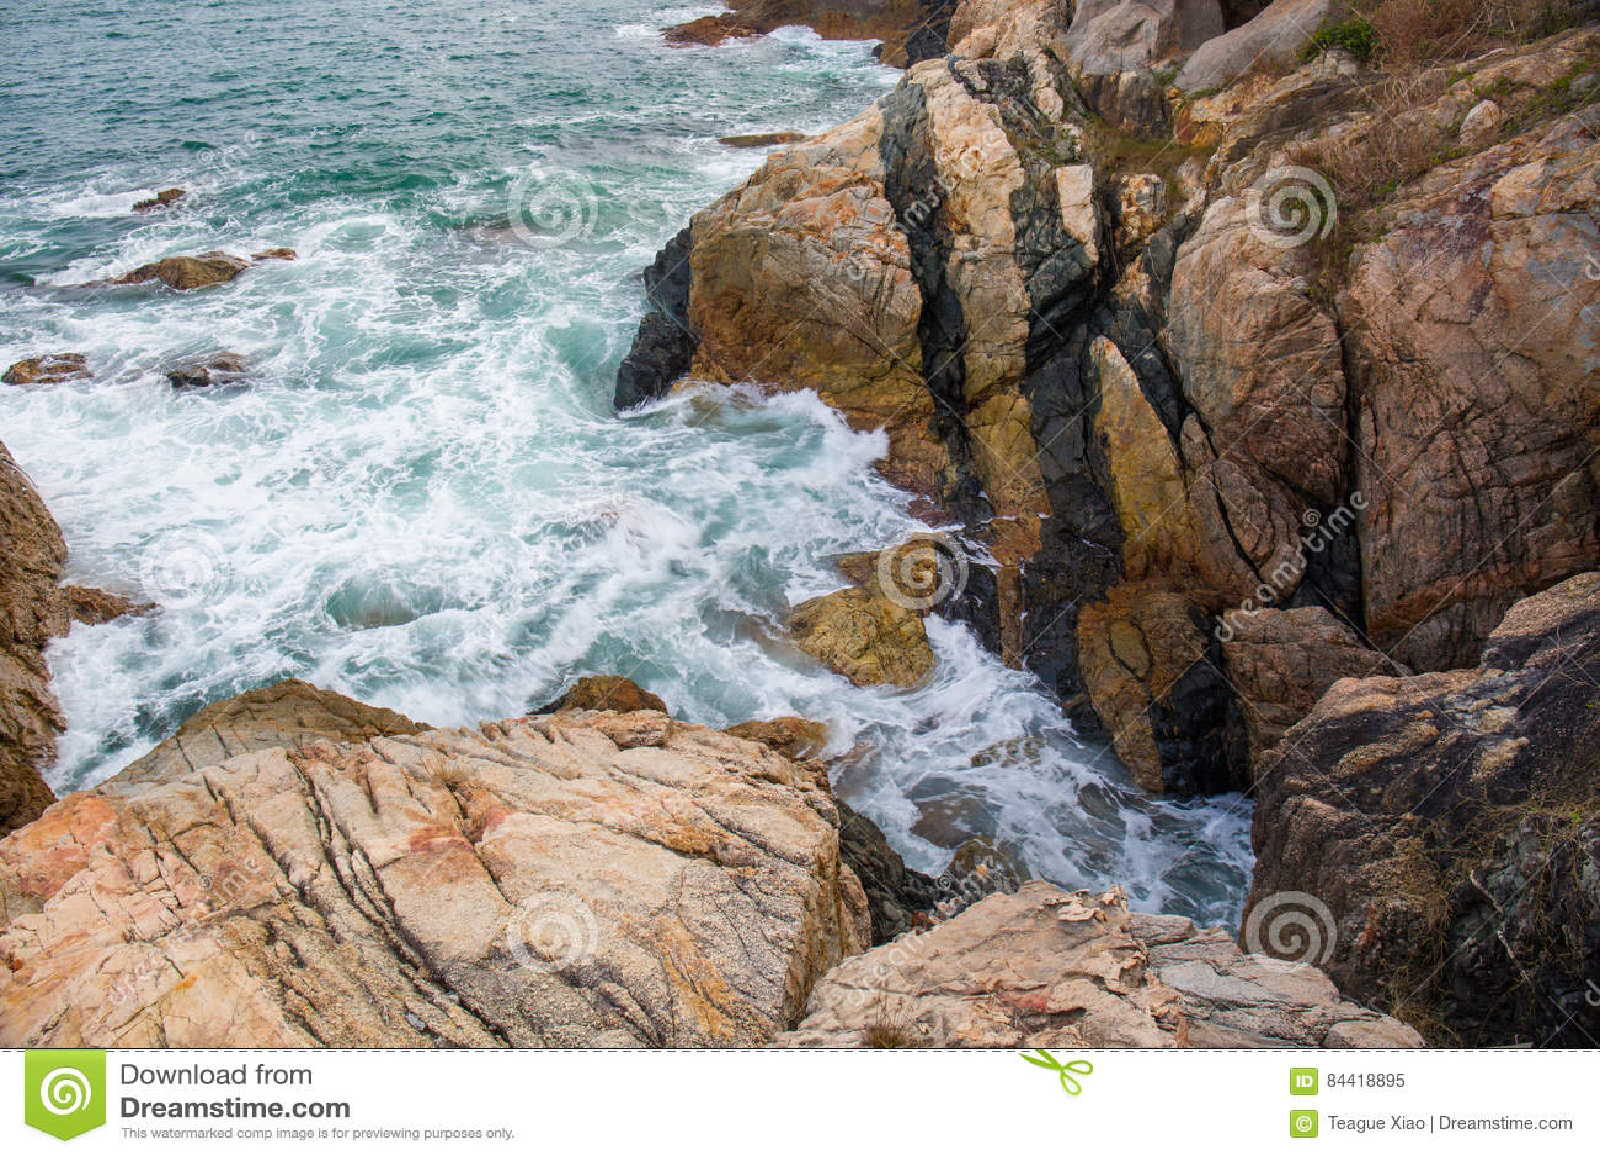 Meereswogespritzen auf dem Riffvideo